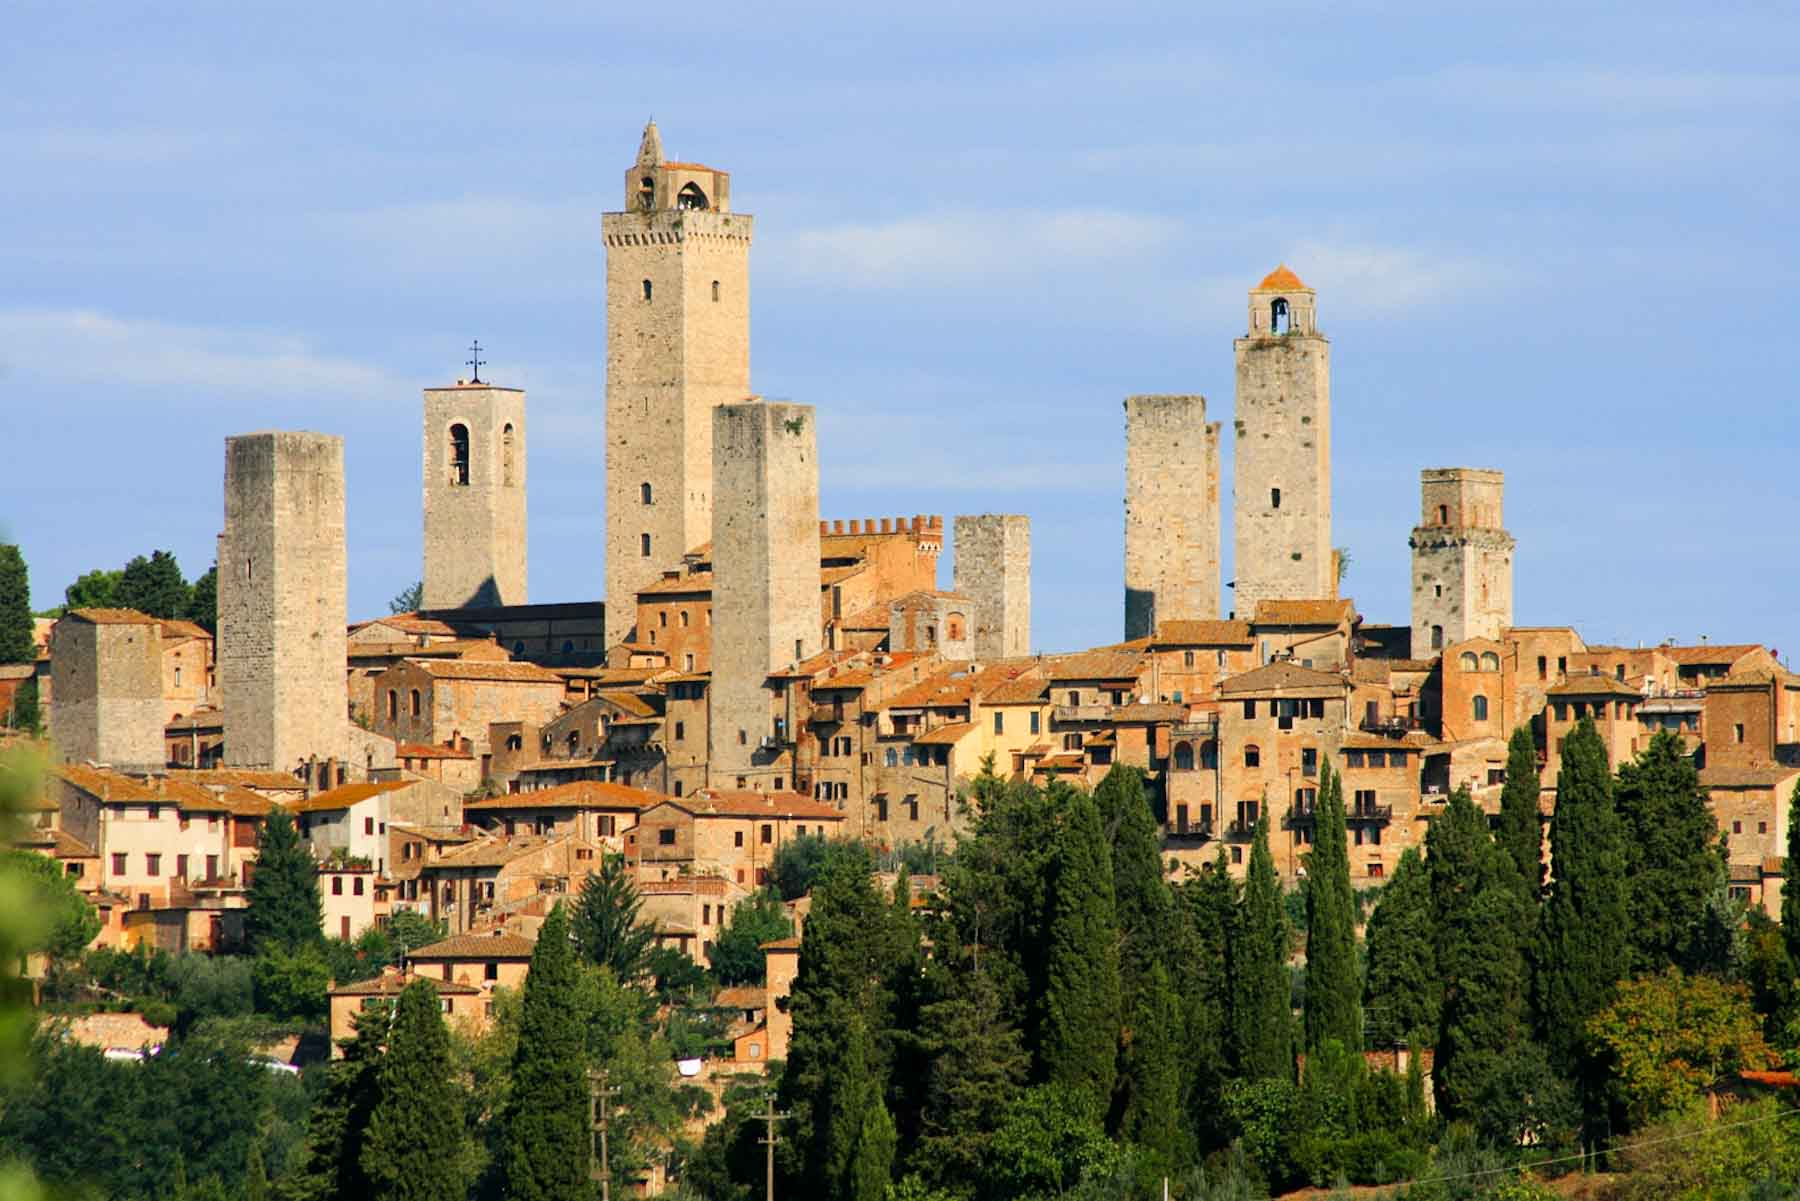 San Gimignano 5 bell towers